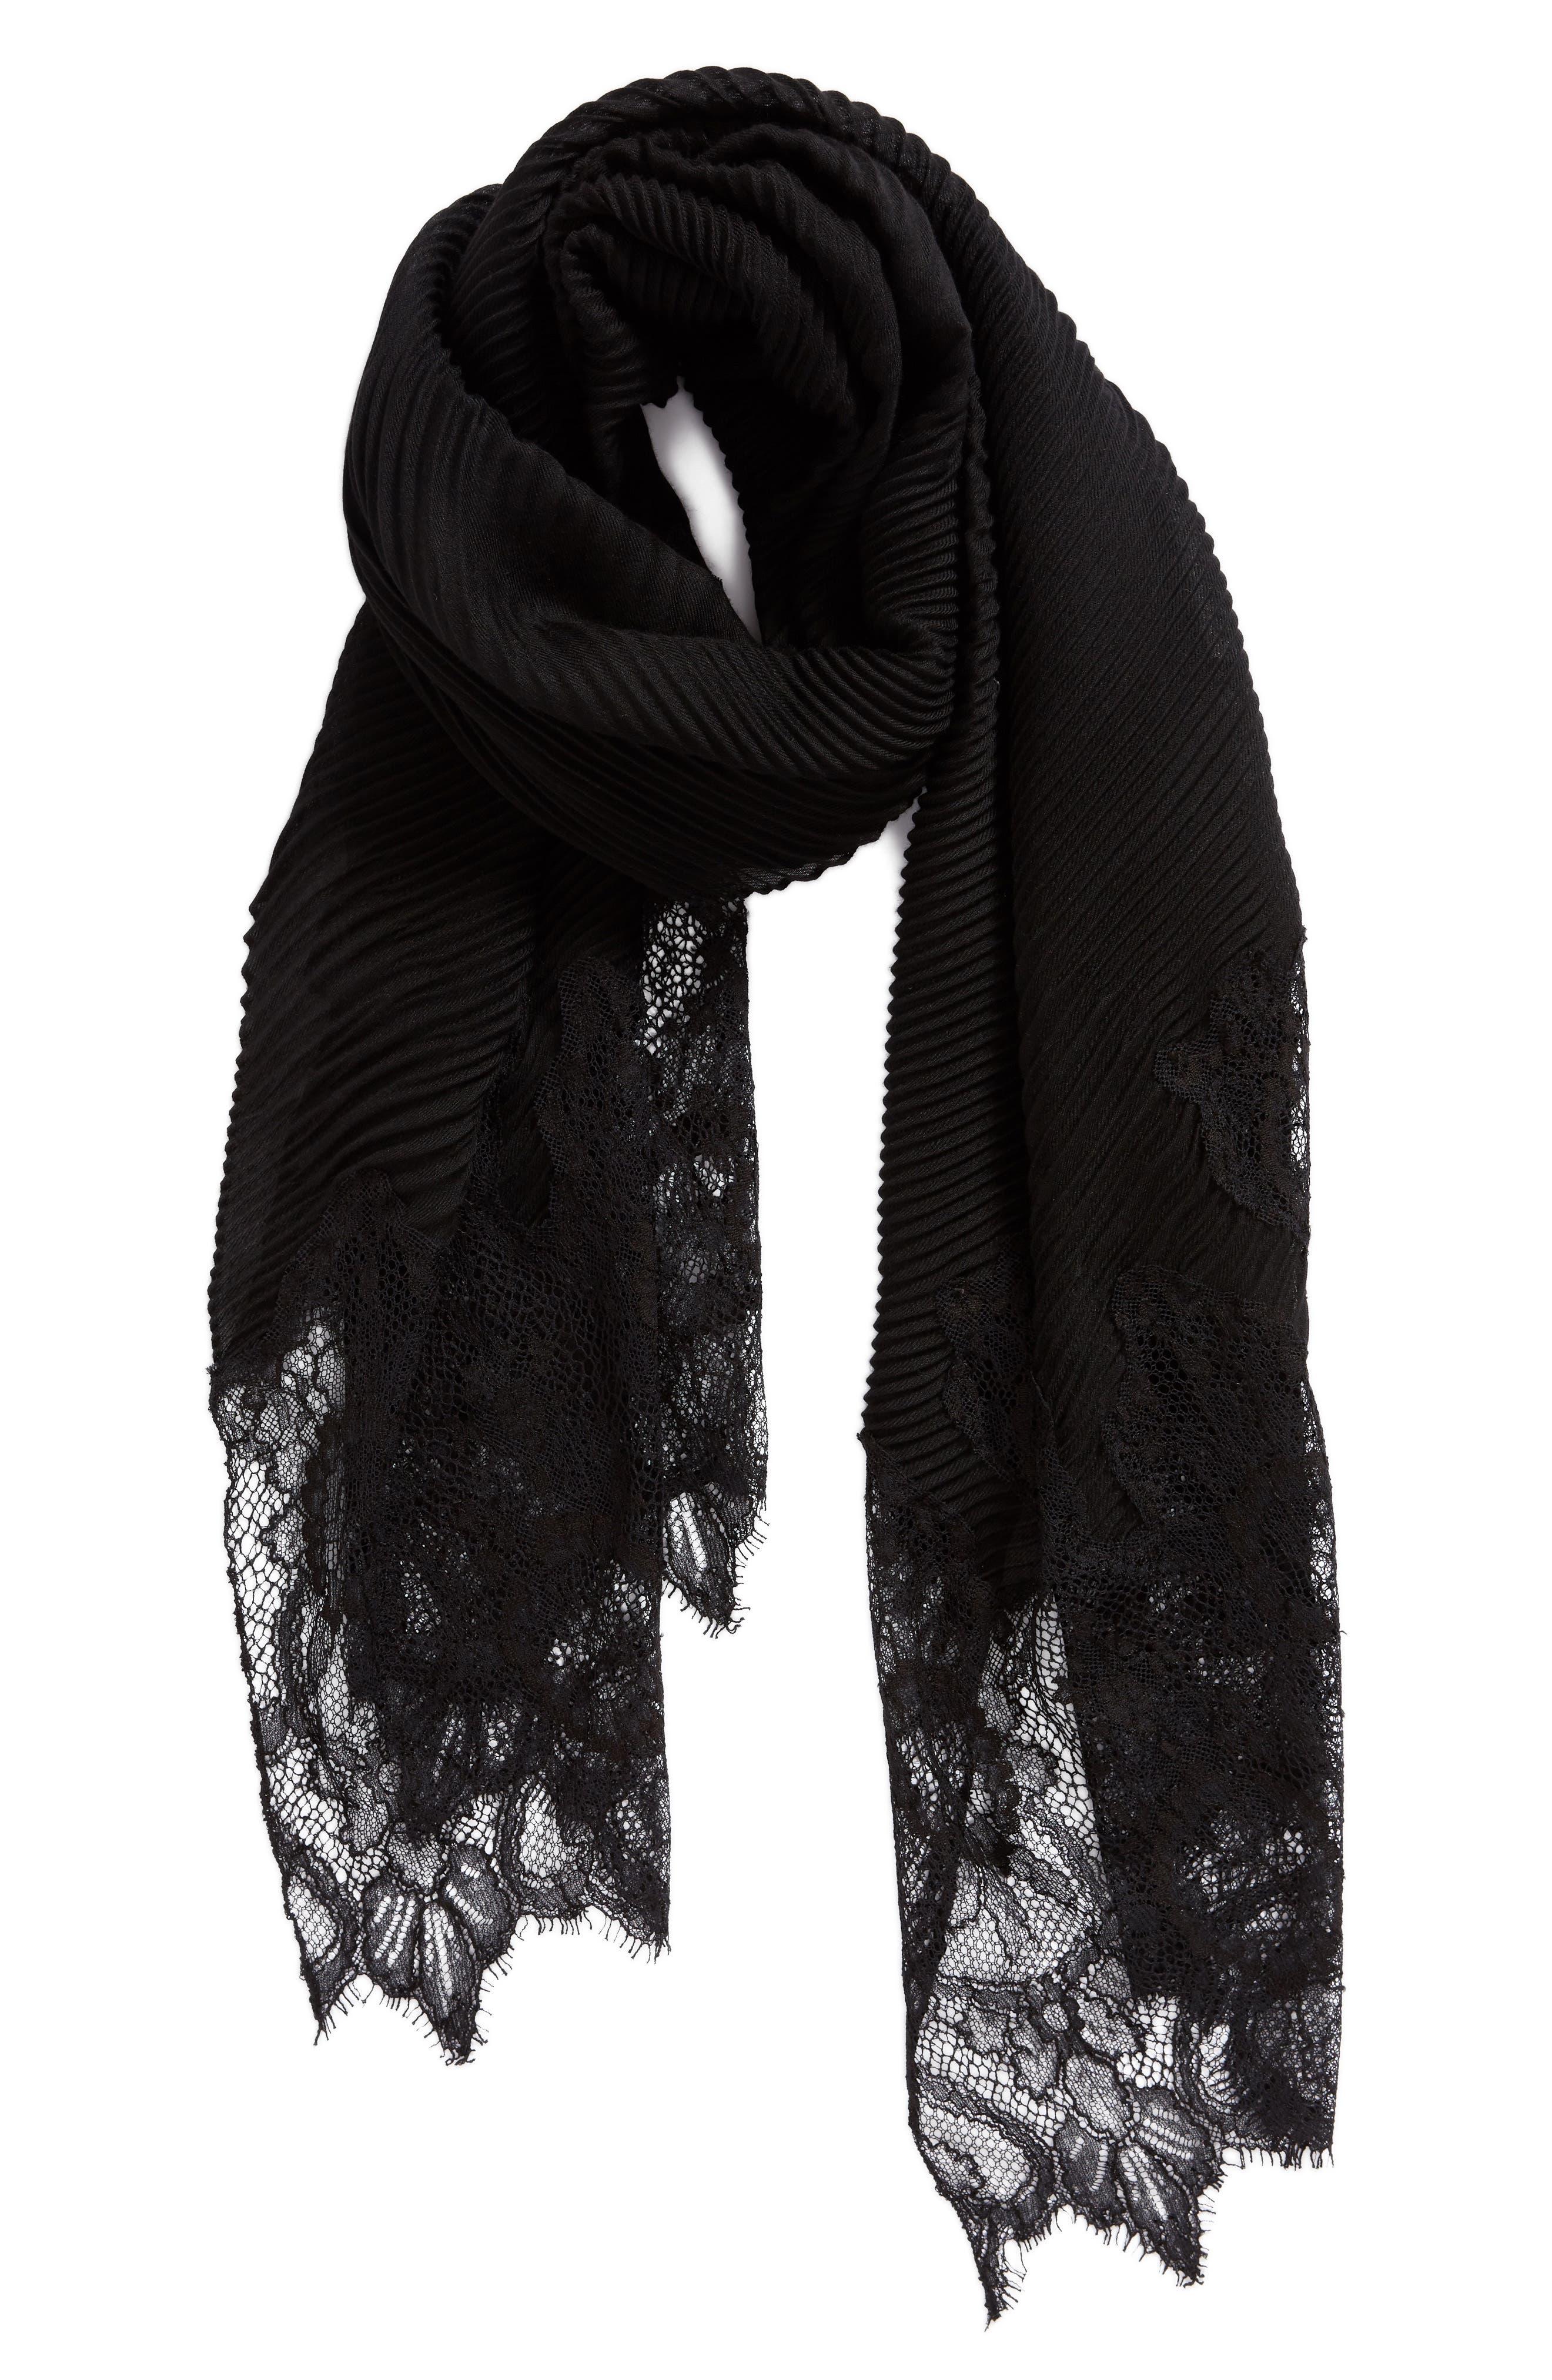 VALENTINO,                             Cashmere & Wool Wrap,                             Alternate thumbnail 3, color,                             NERO/ NERO